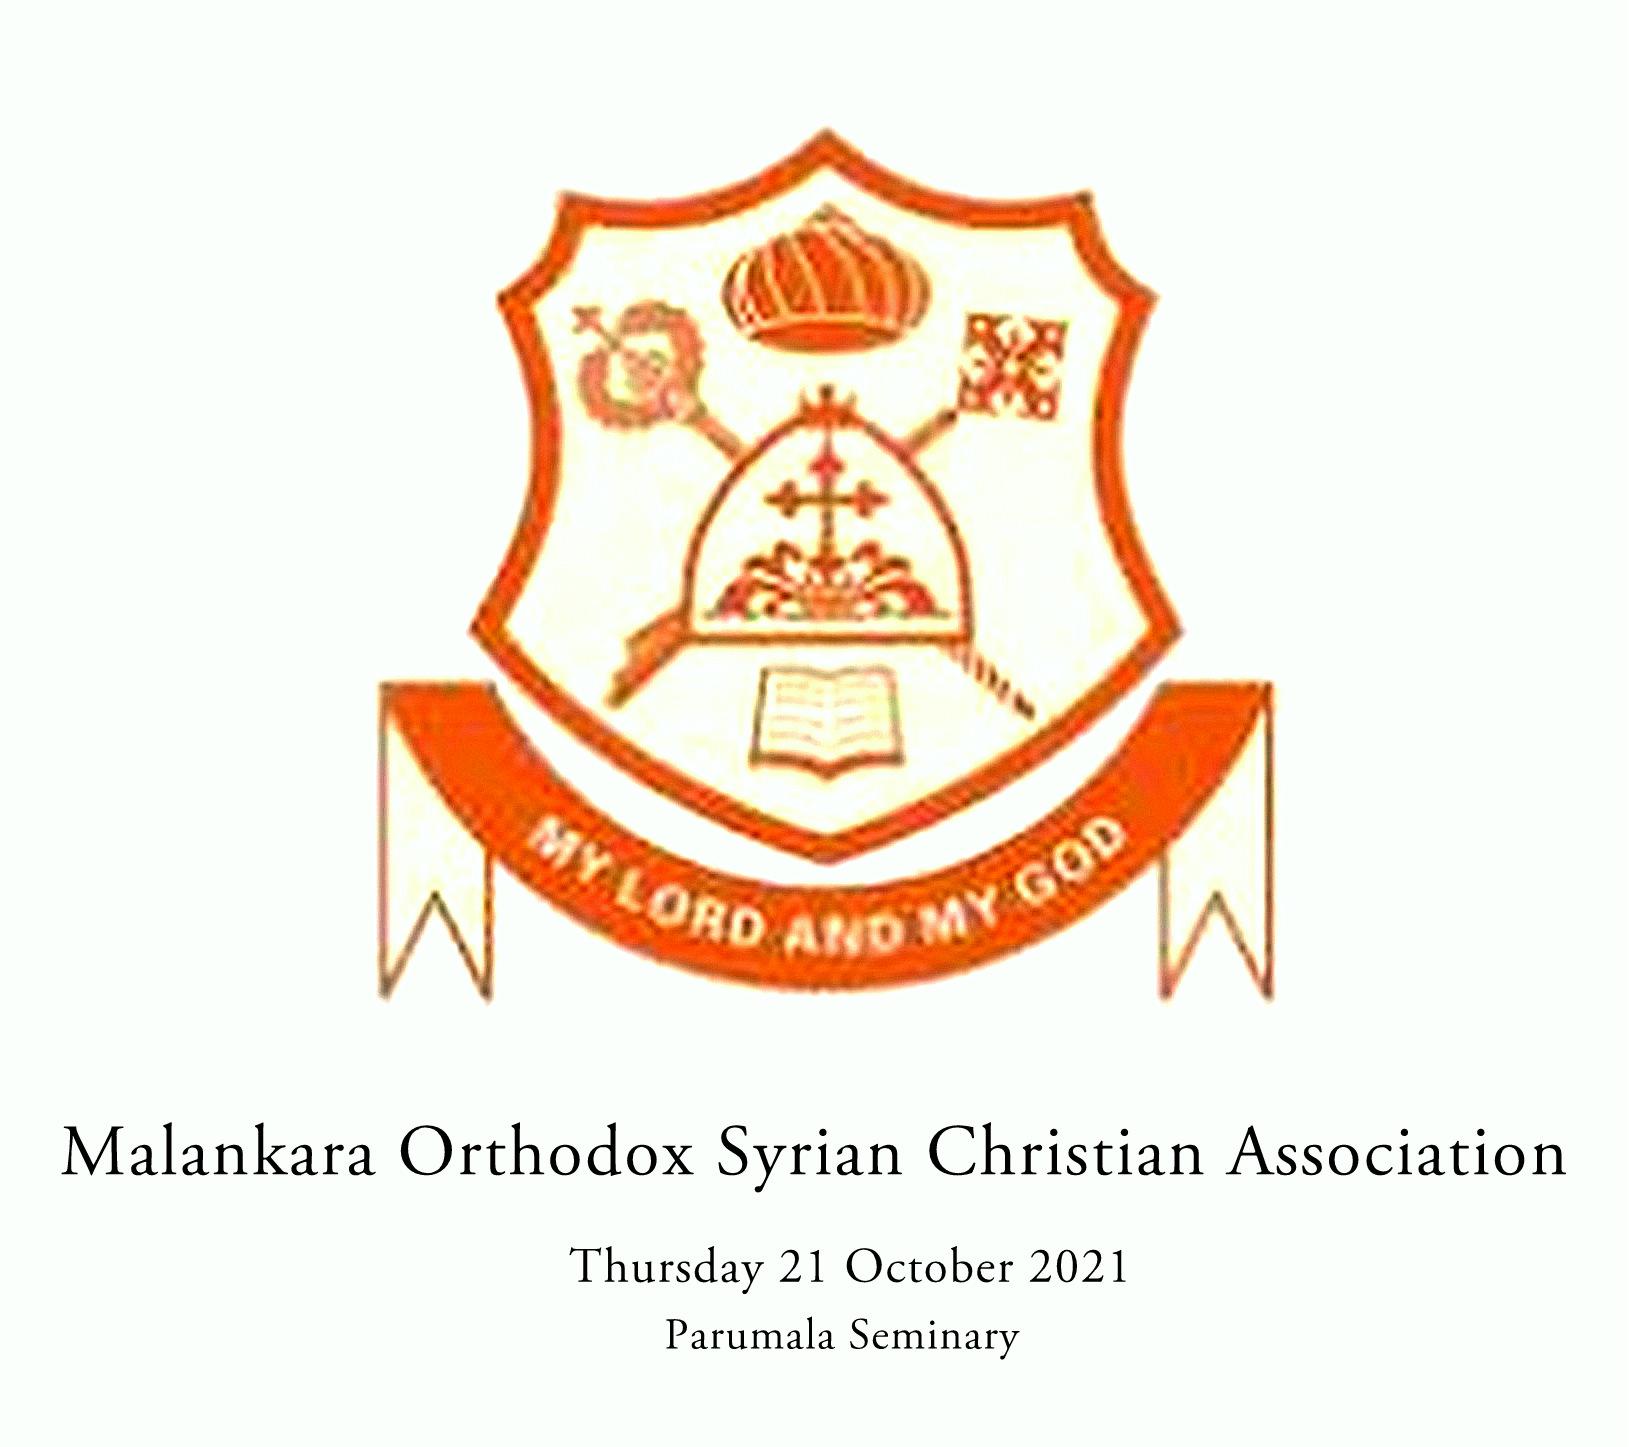 Malankara Orthodox Syrian Christian Association to be held on Thursday 21 October 2021 at 1pm IST